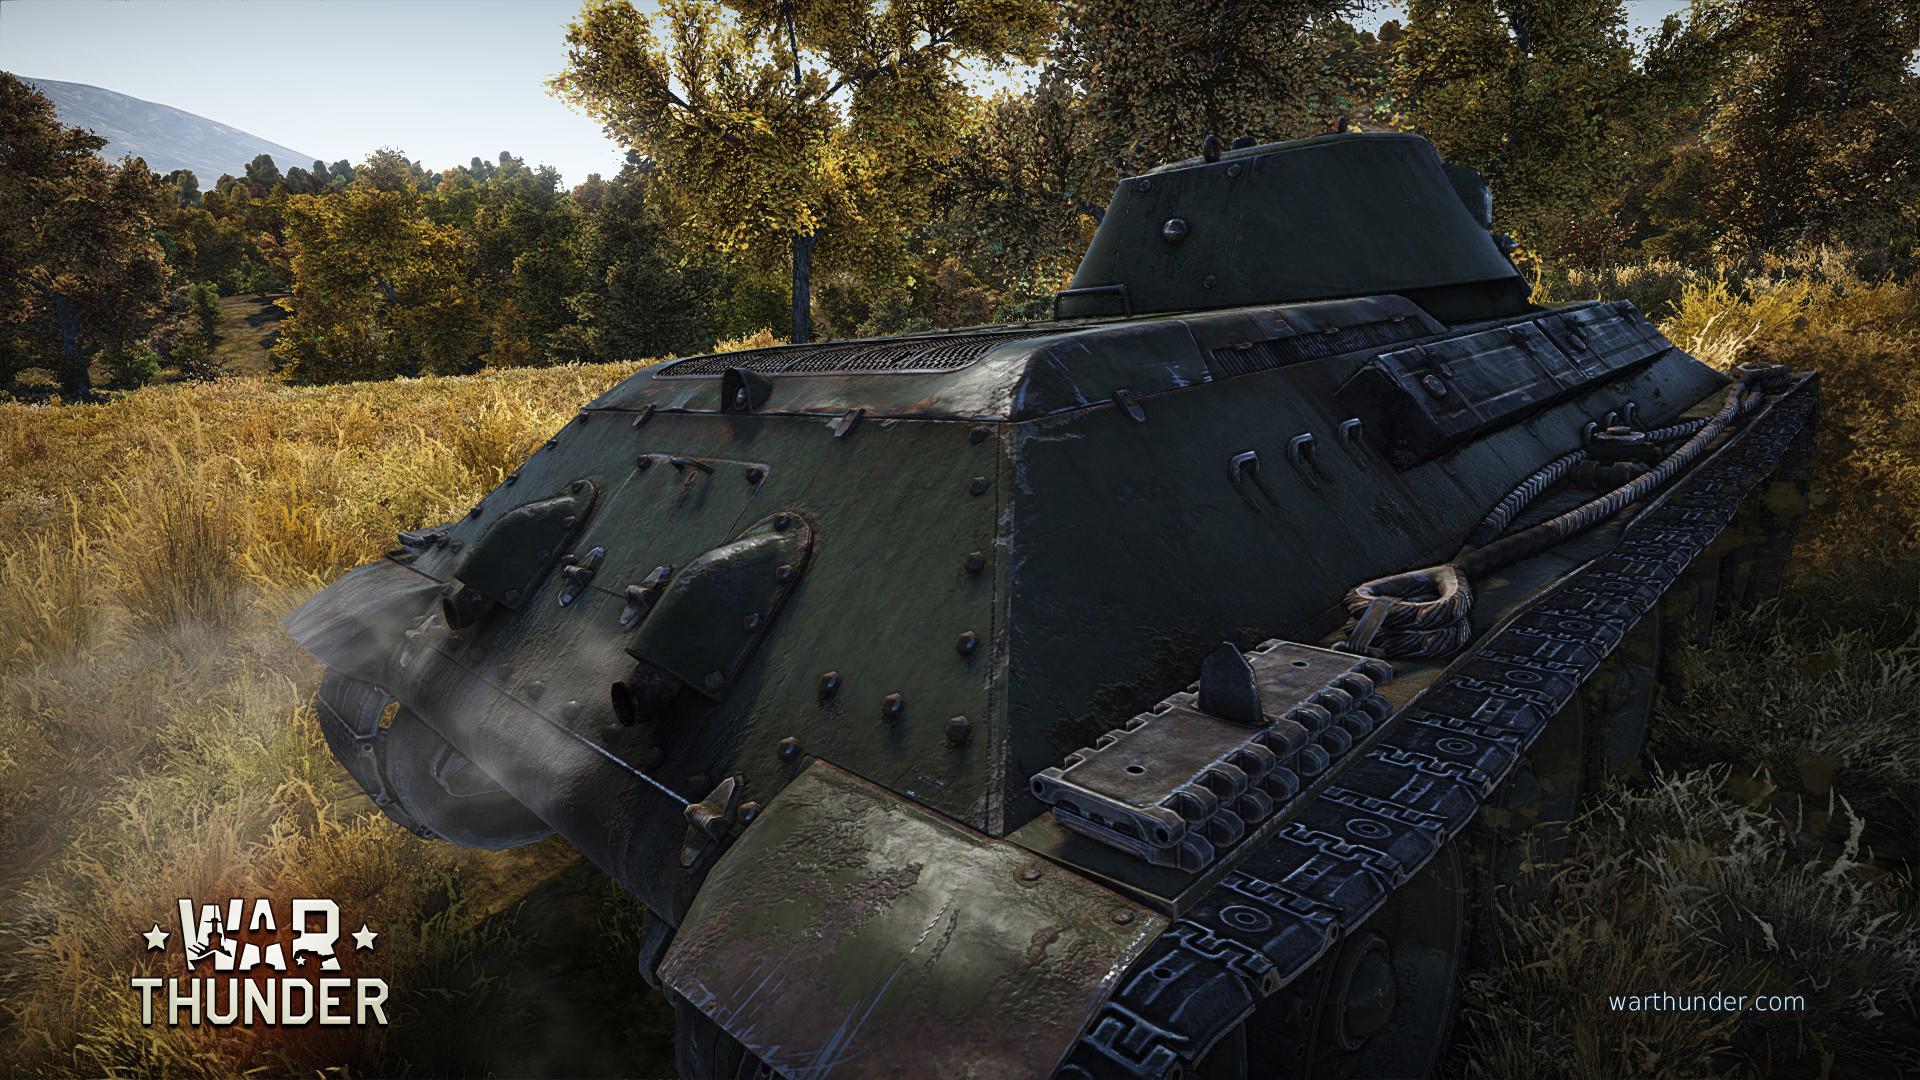 war thunder nextgen mmo combat game for pc mac linux